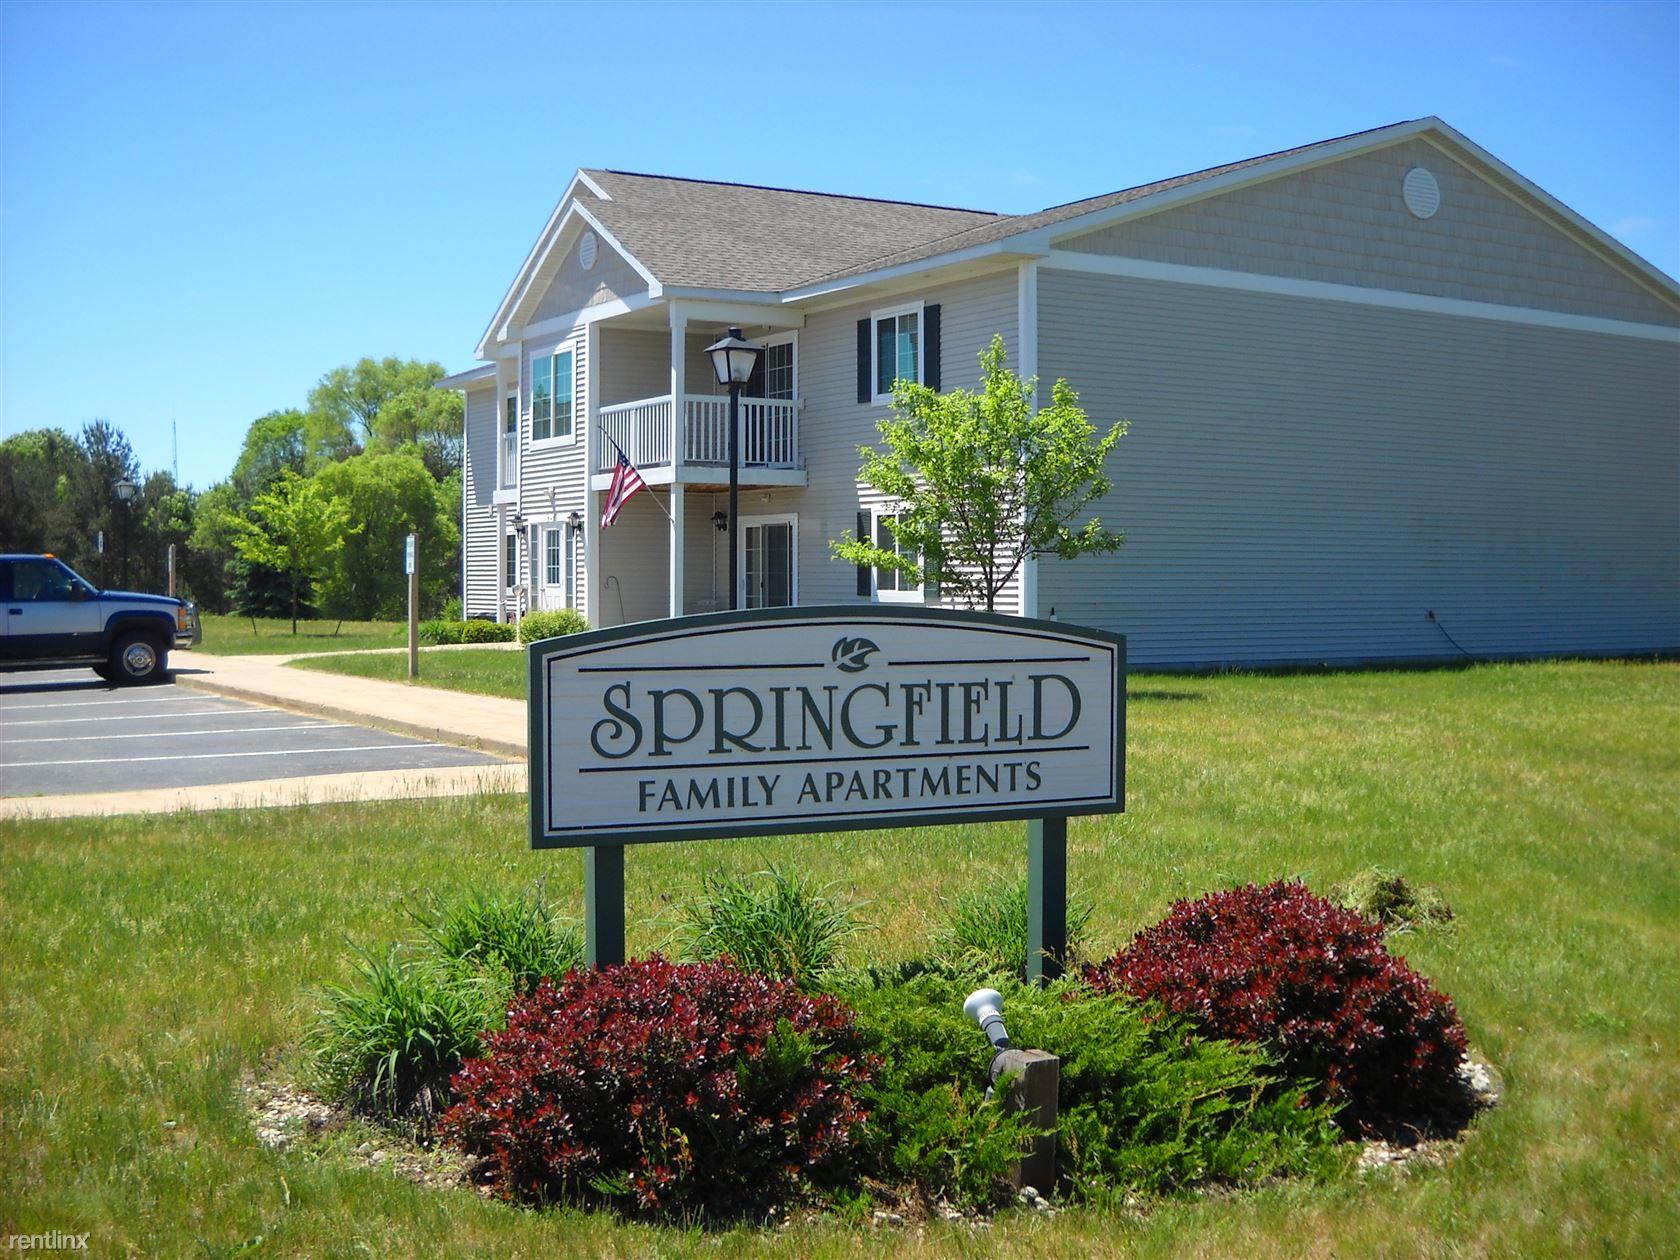 Springfield Apartments